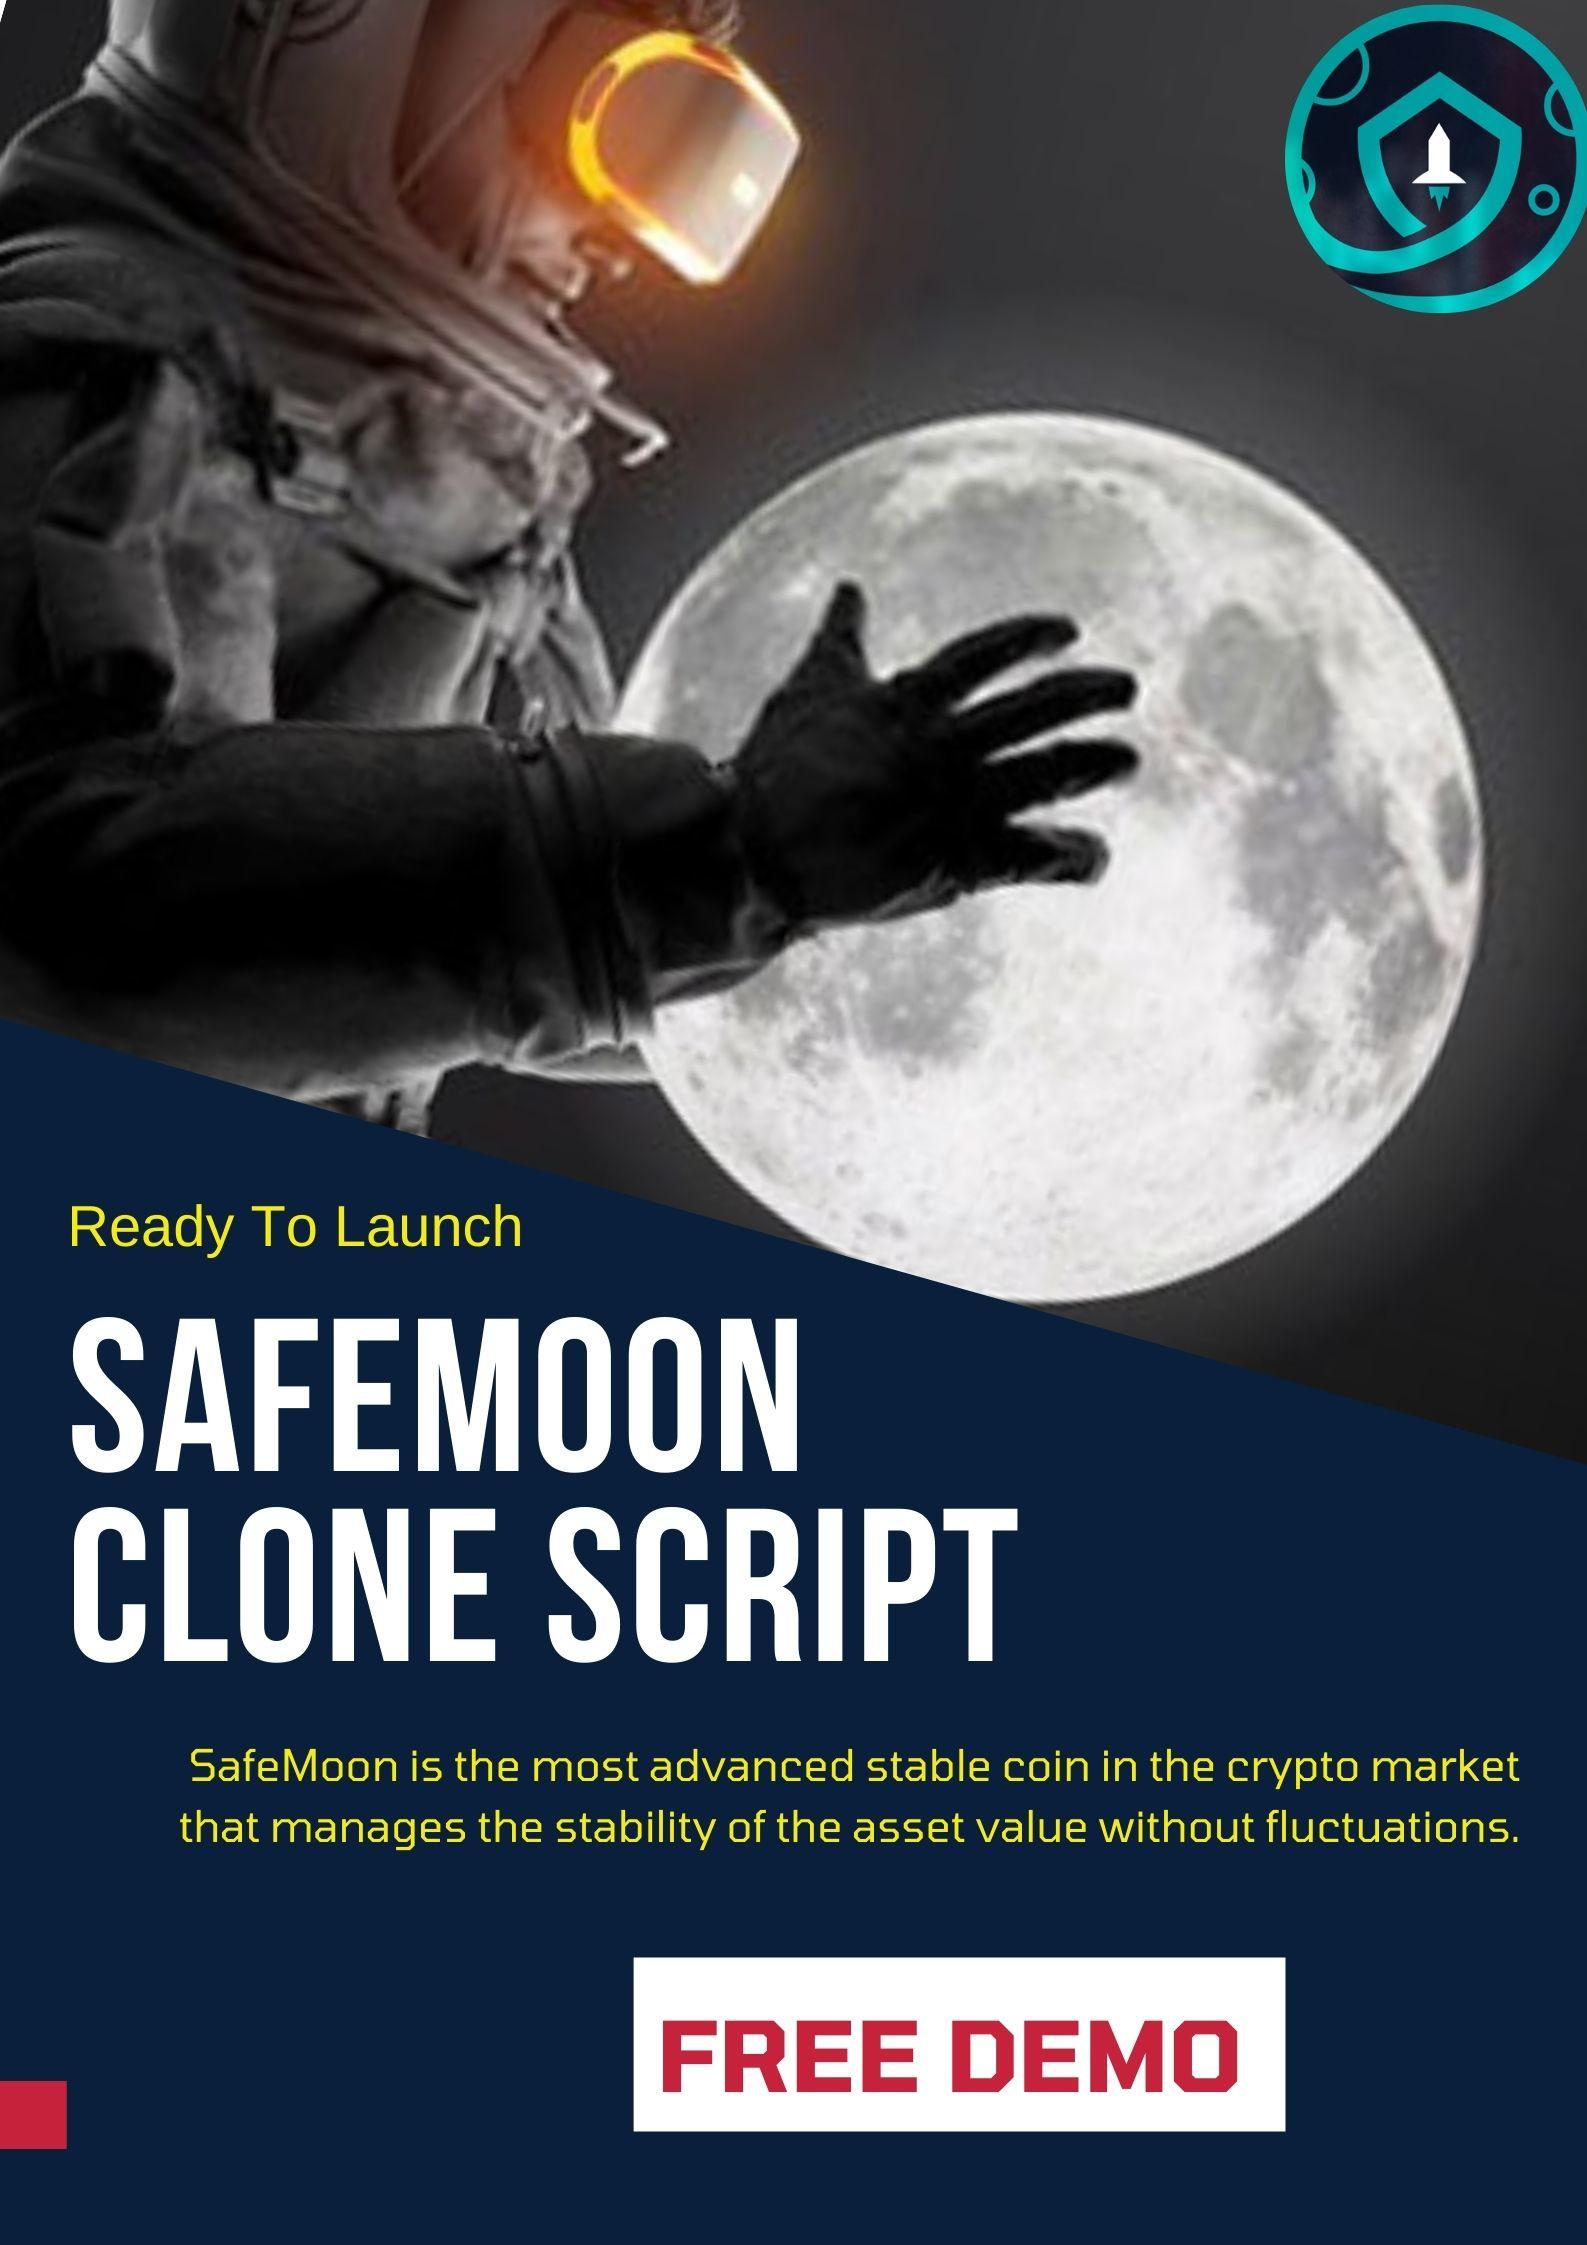 SafeMoon Clone Script To Create Fundraising DeFi Protocol Like SafeMoon